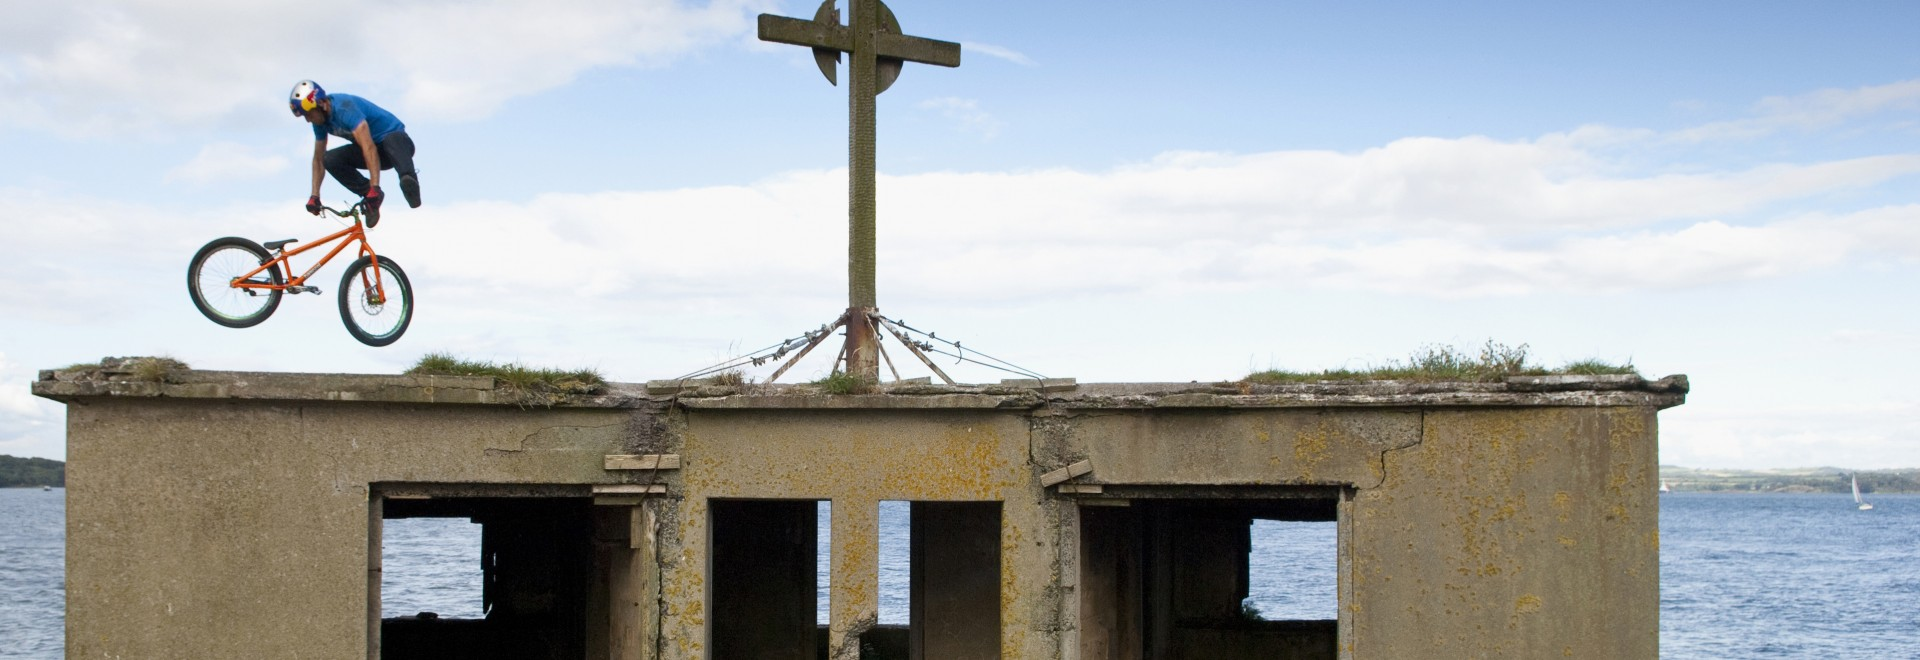 Danny MacAskill: Imaginate / Way back Home